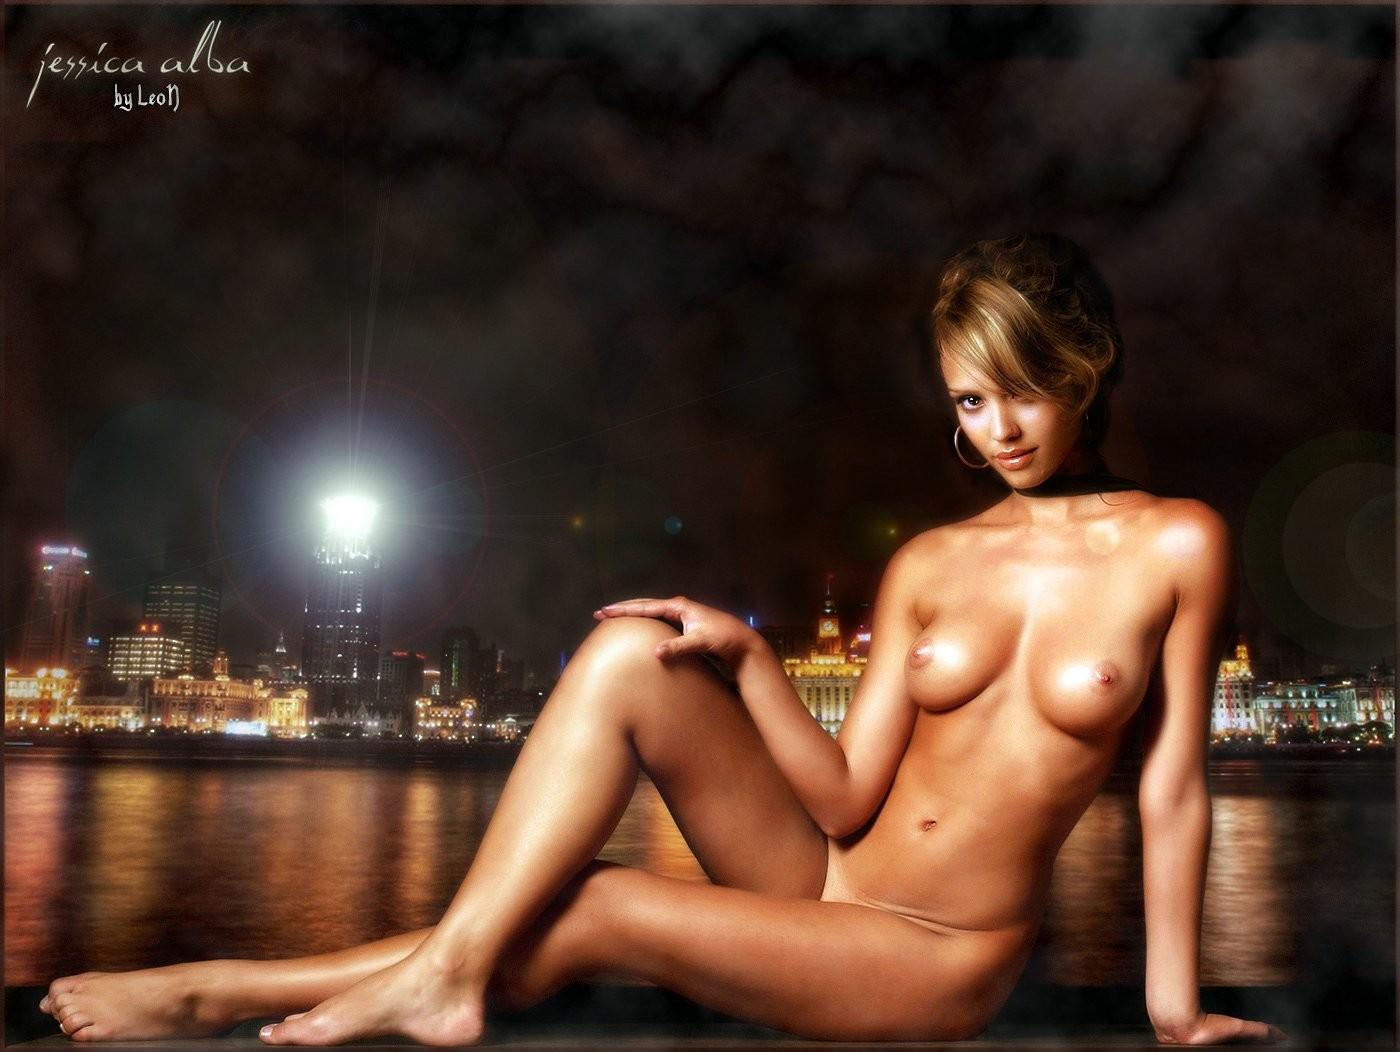 Were Jessica alba naked dildo